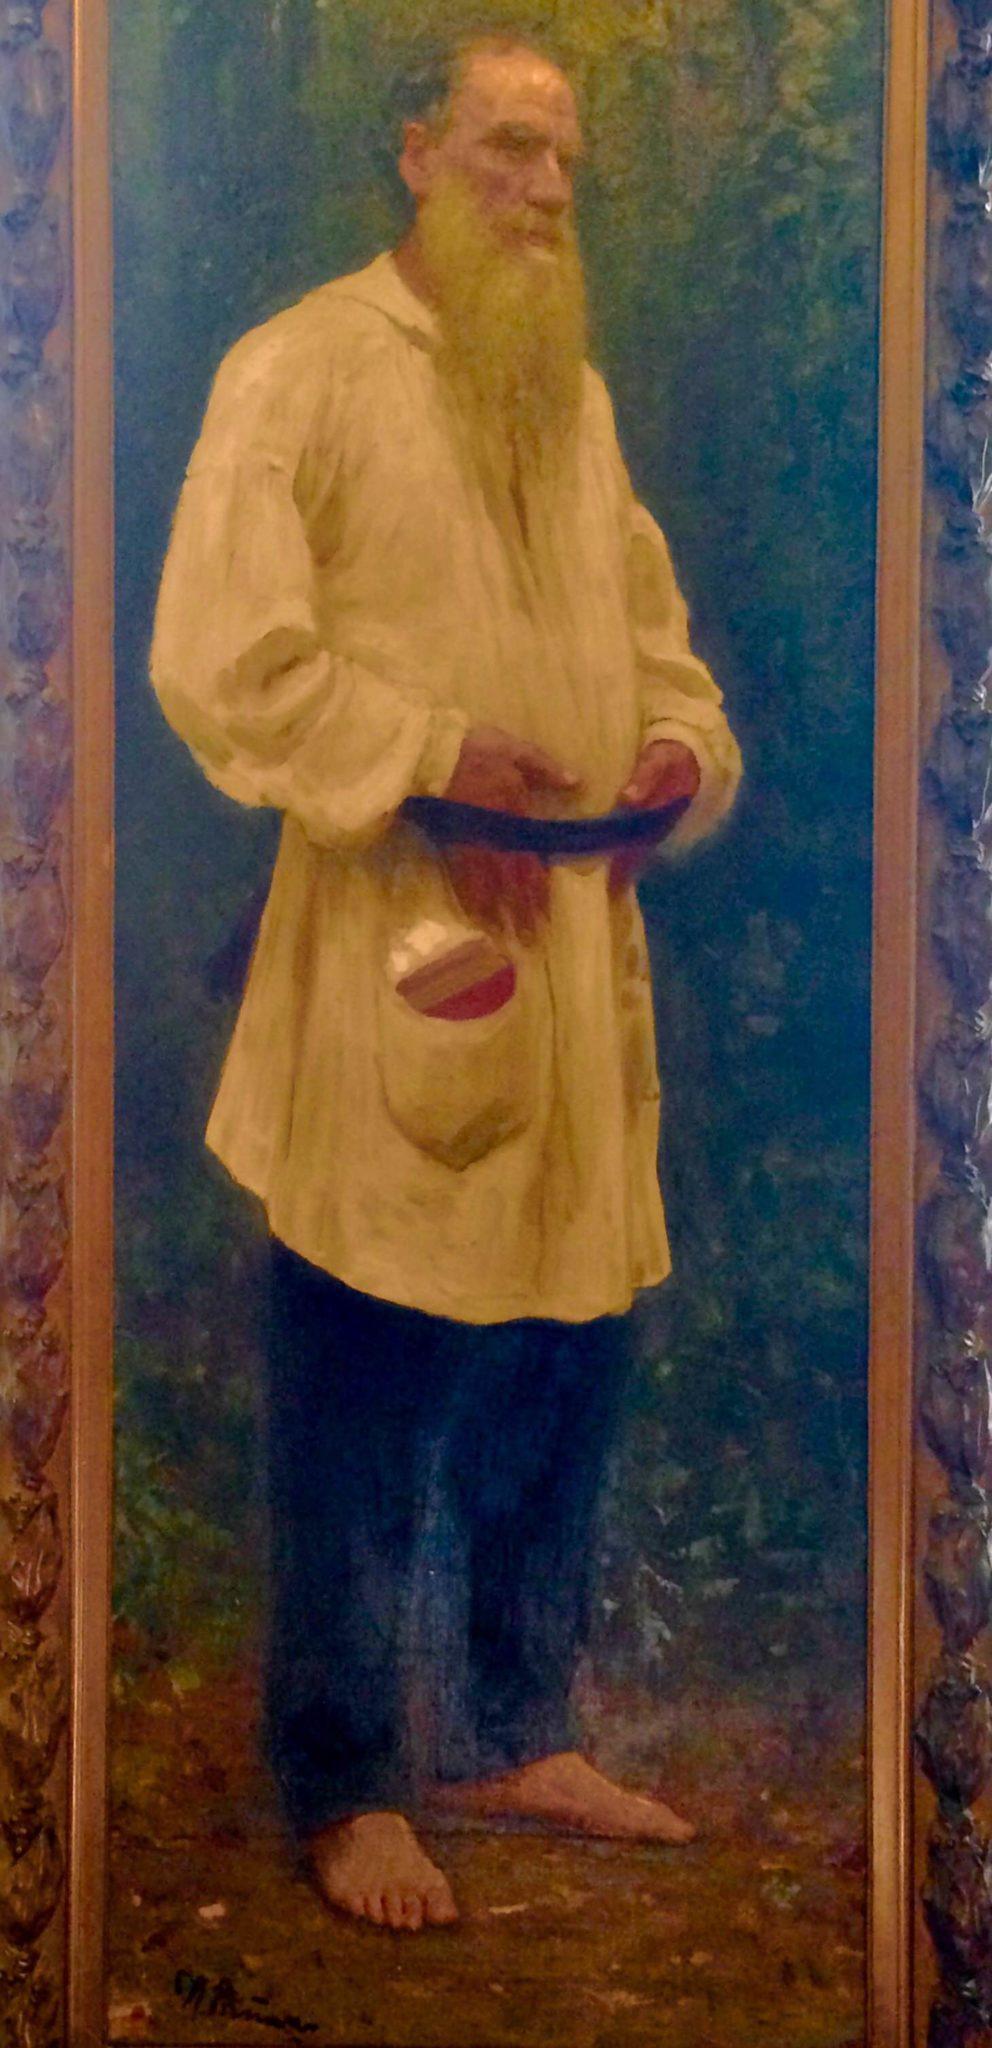 Portrait of older man in peasant tunic